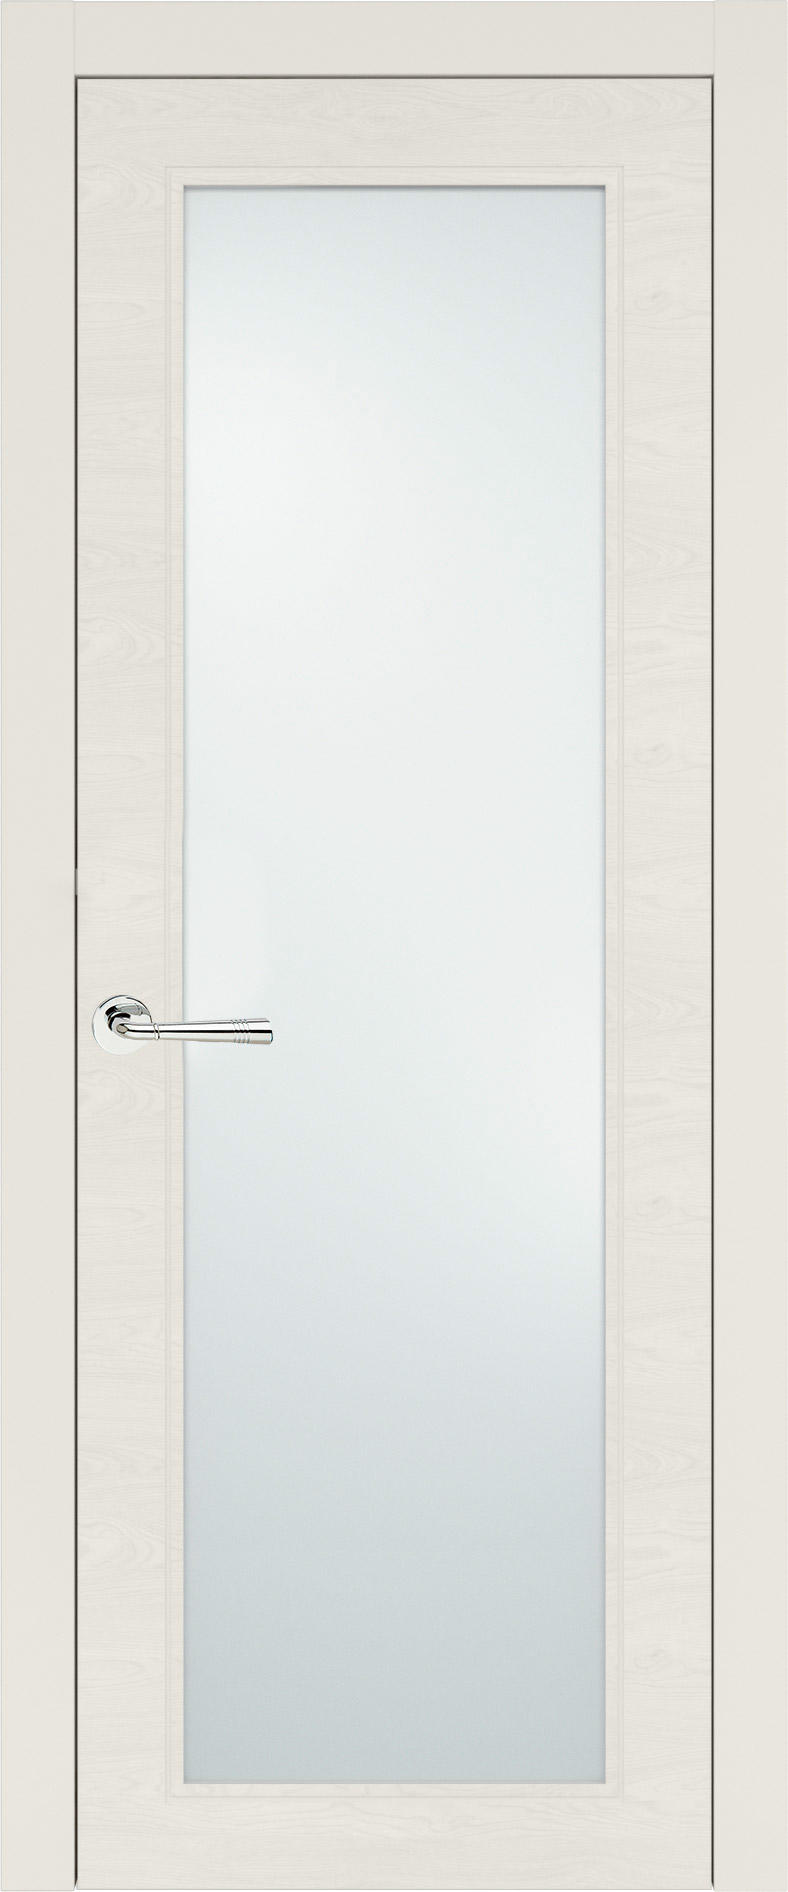 Domenica Neo Classic цвет - Бежевая эмаль по шпону (RAL 9010) Со стеклом (ДО)